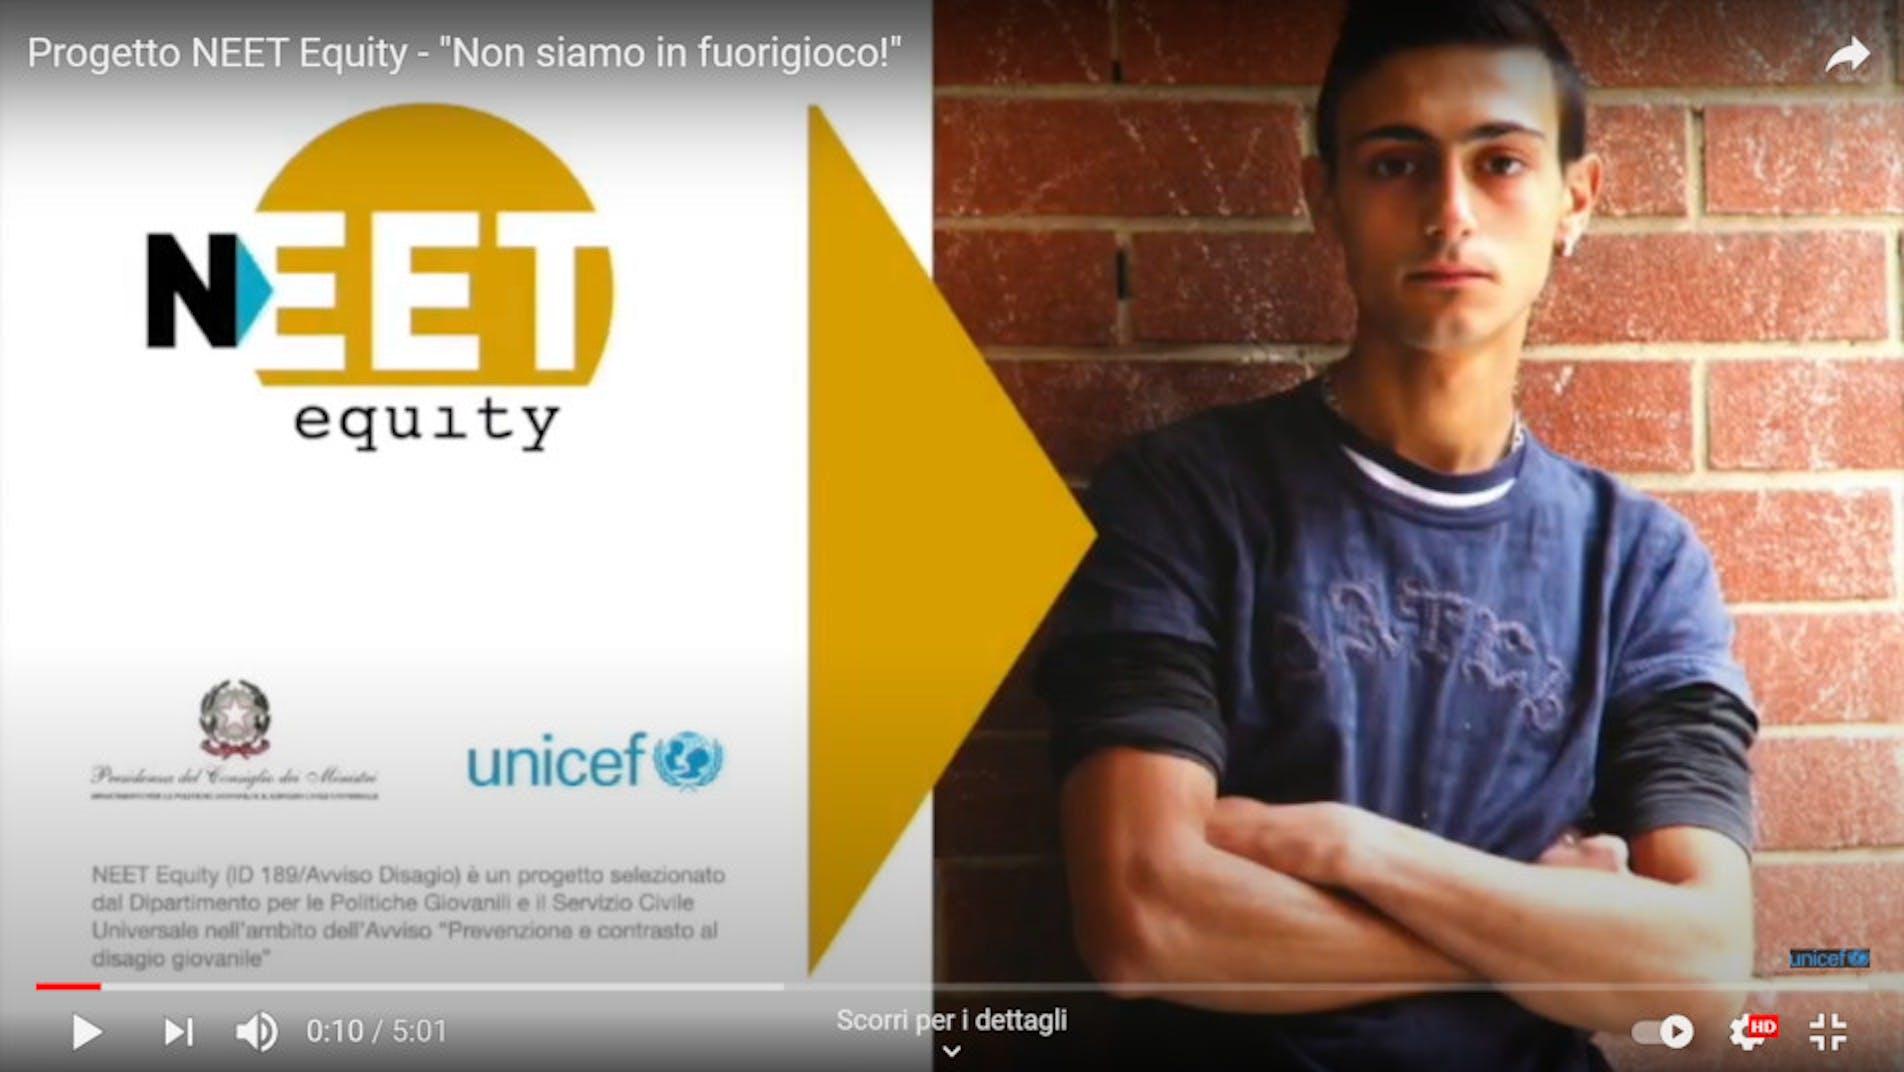 video Neet equity